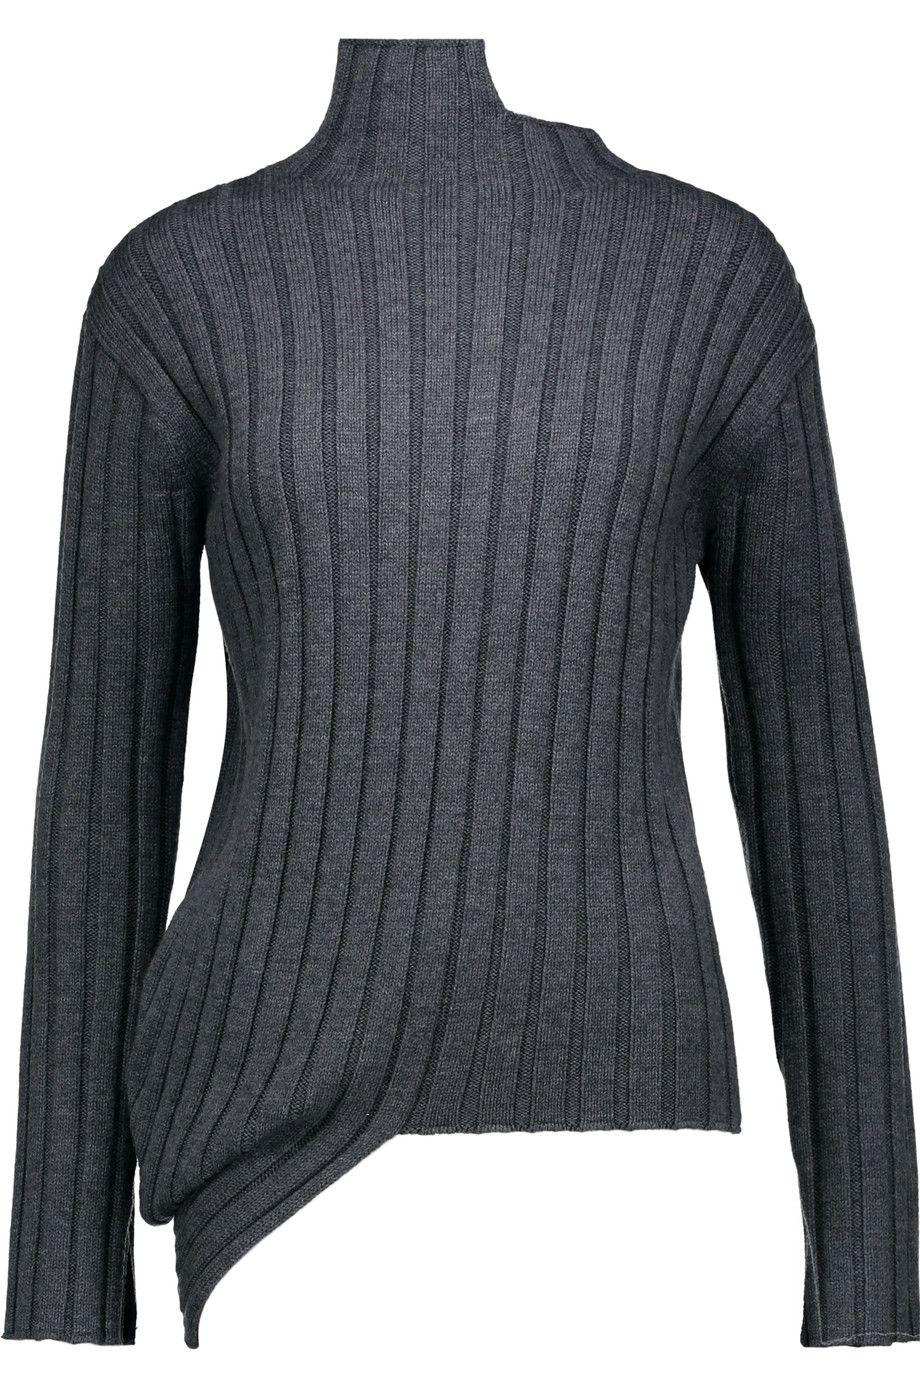 JOSEPH Asymmetric merino-wool sweater. #joseph #cloth #sweater